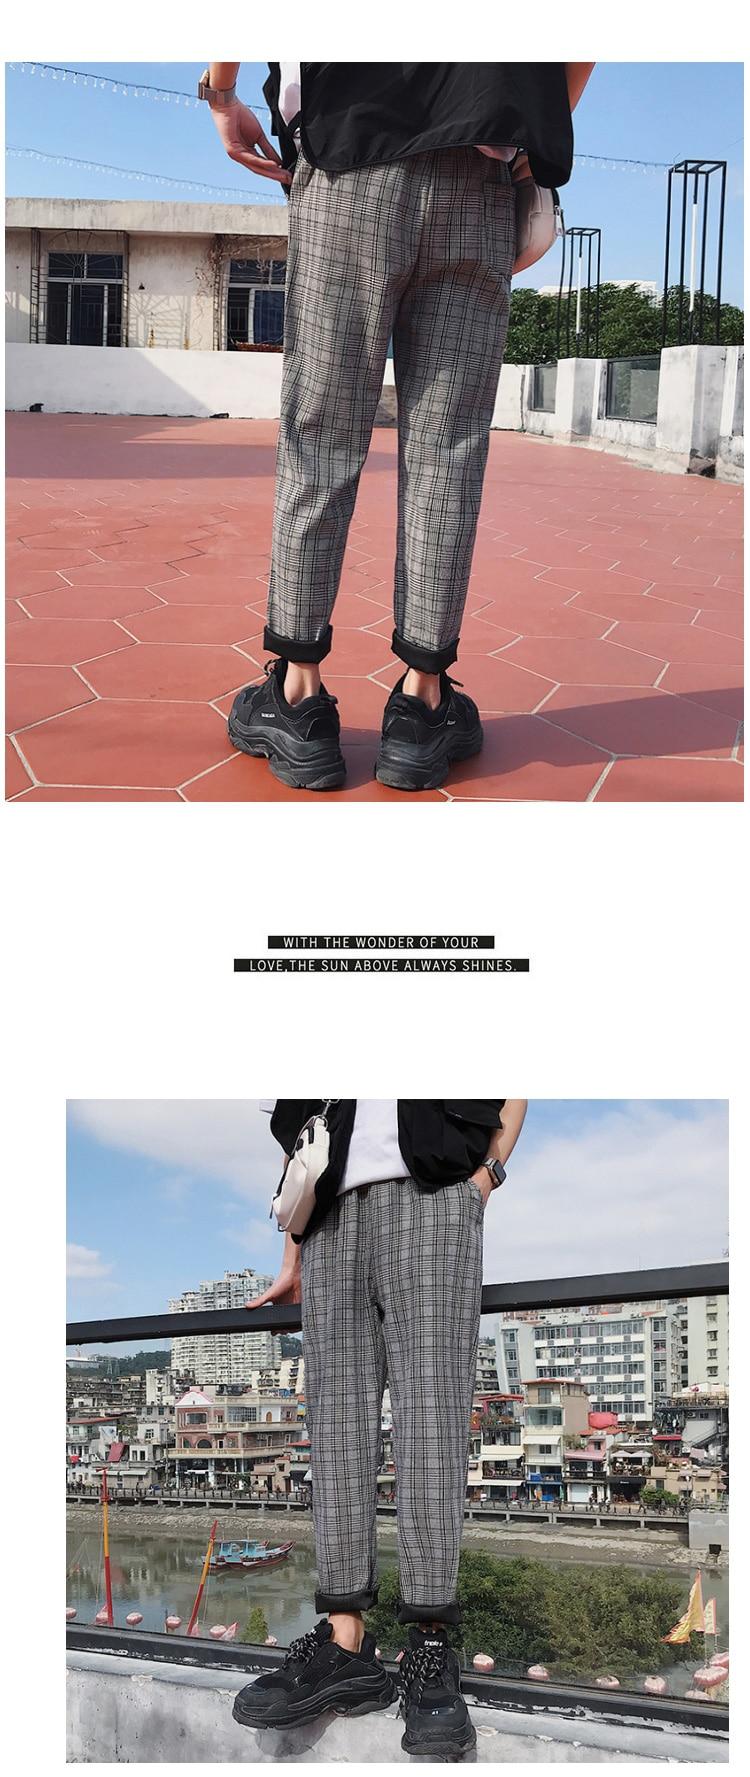 HTB104eobzzuK1Rjy0Fpq6yEpFXa4 LAPPSTER Streetwear Yellow Plaid Pants Men Joggers 2019 Man Casual Straight Harem Pants Men Korean Hip Hop Track Pants Plus Size